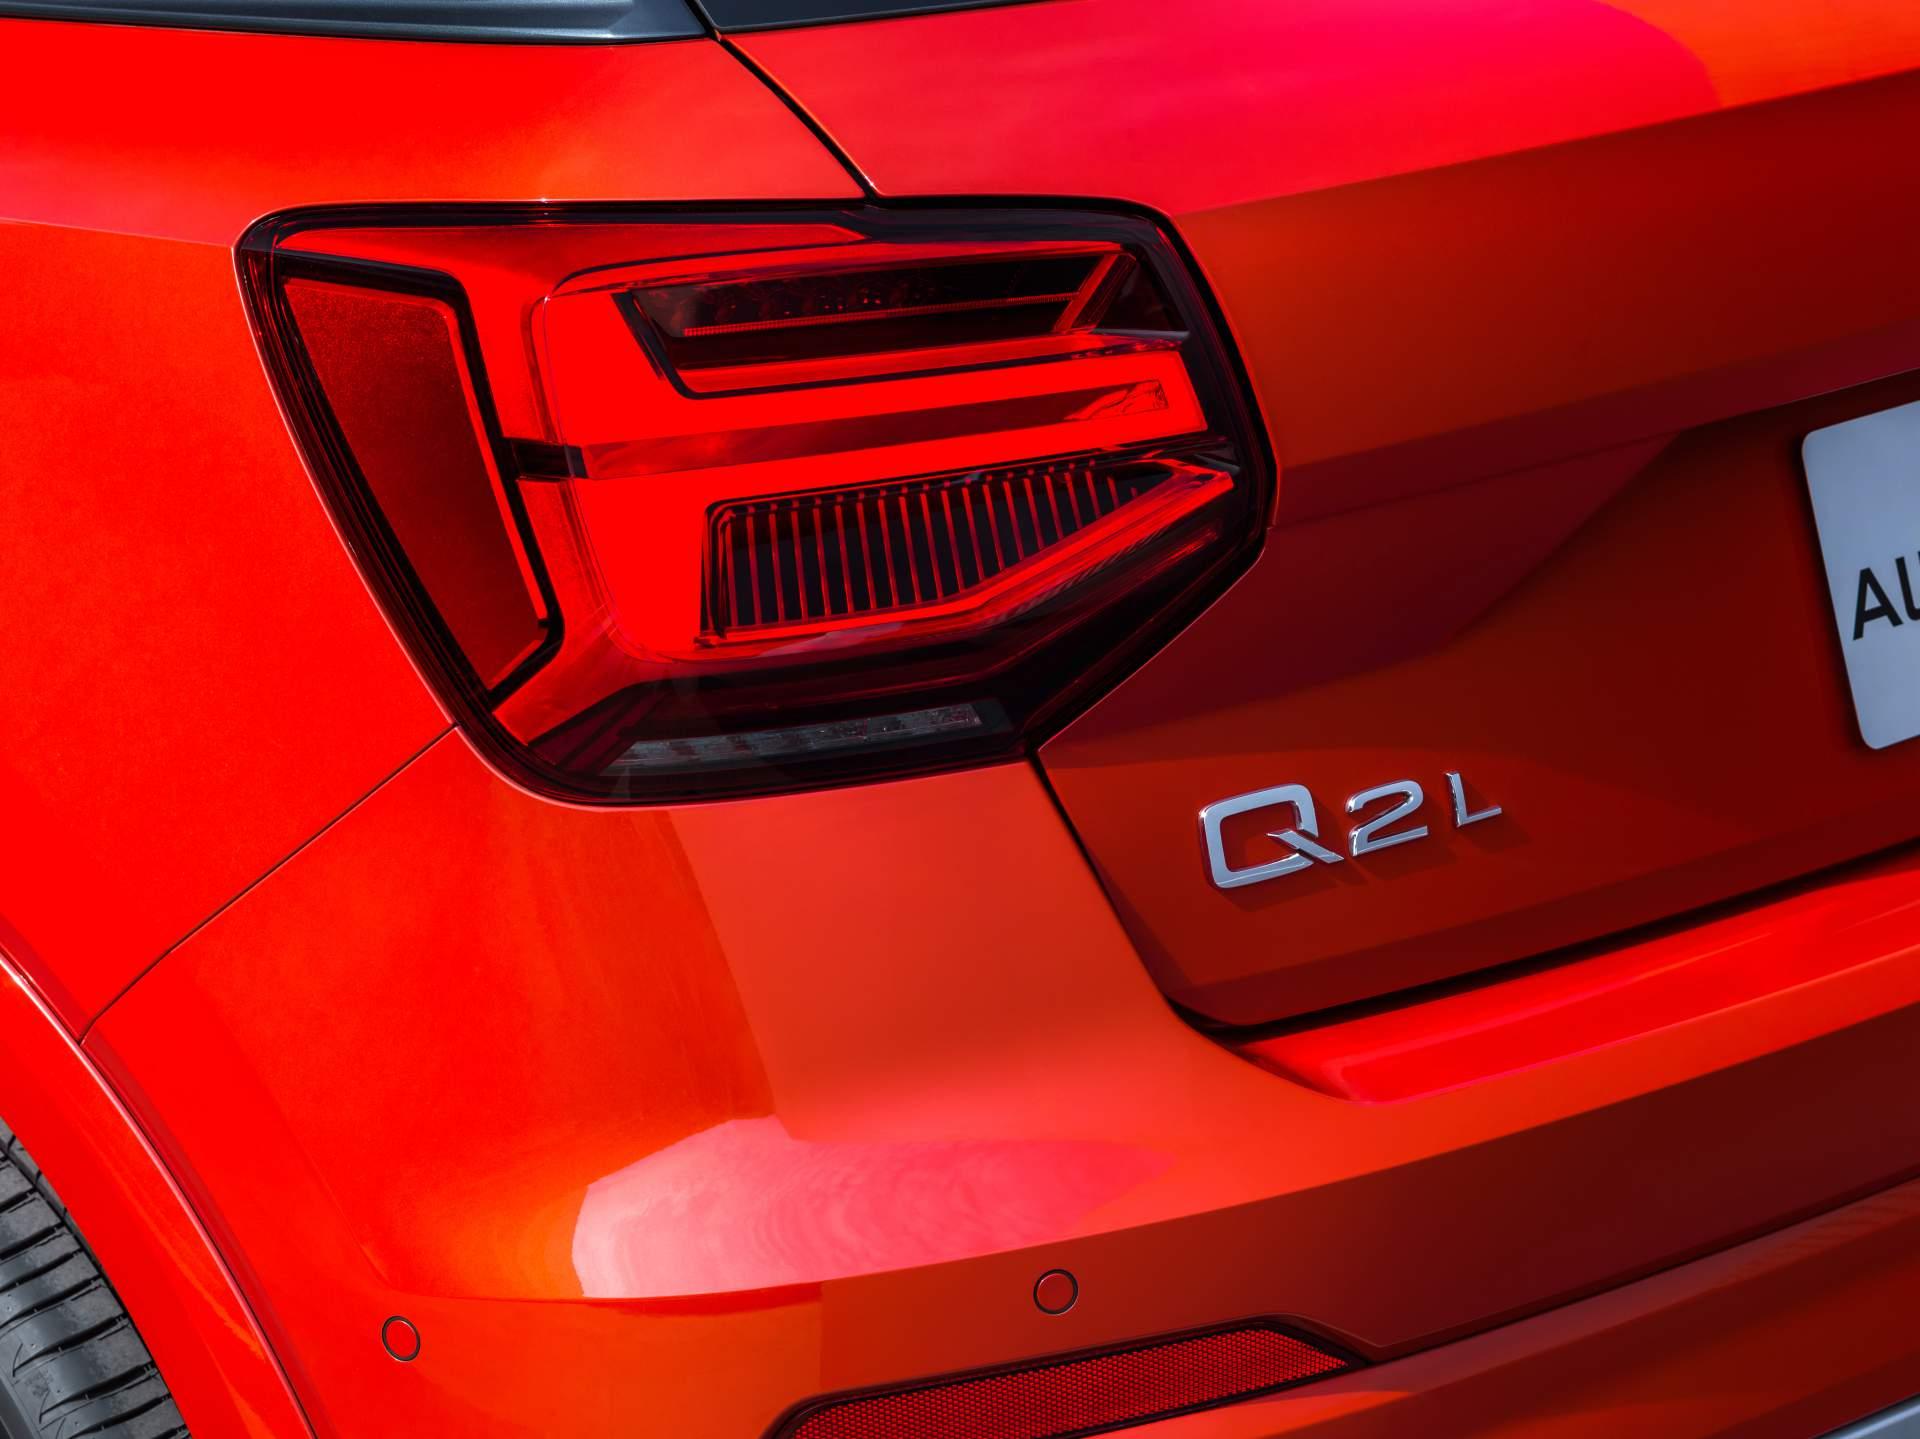 Audi_Q2_L_0024